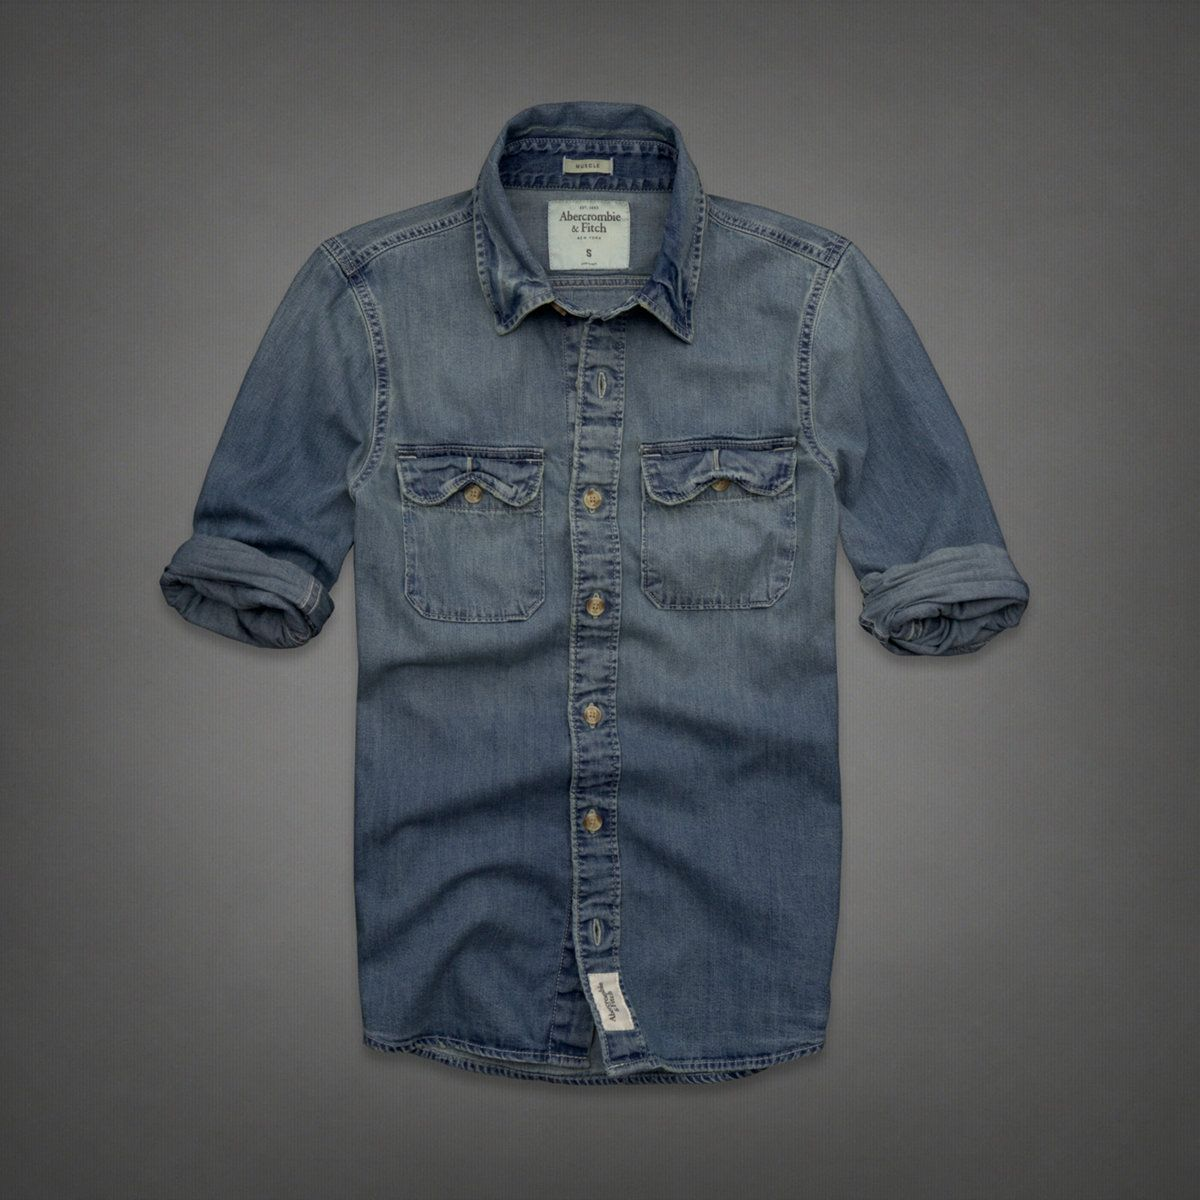 4042d595 Mens Flagstaff Mountain Denim Shirt | Mens Shirts | Abercrombie.com ...